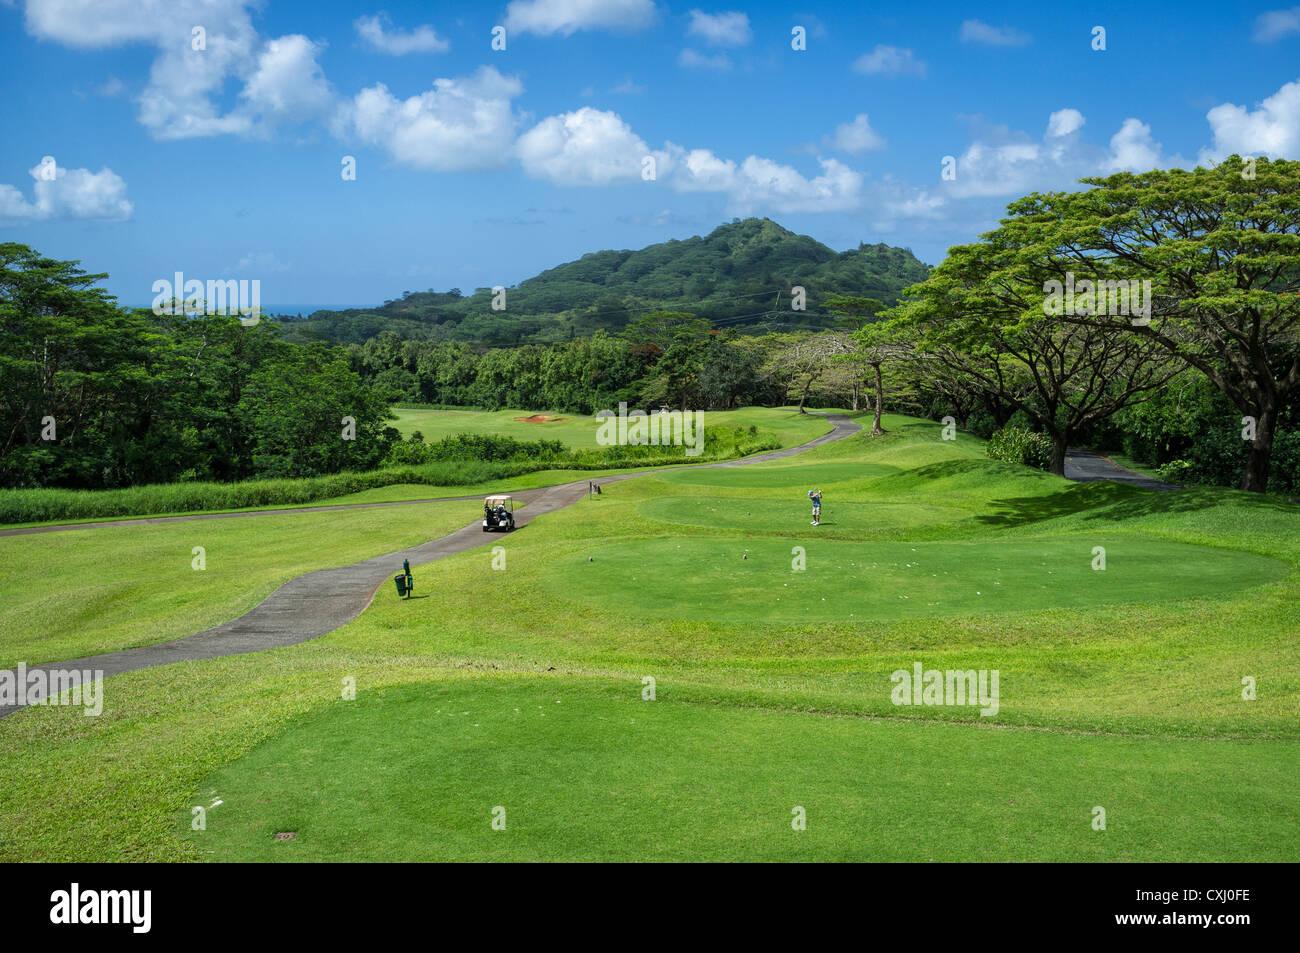 Ko'olau Golf Club near Ko'olau Range in Kaneohe, Hawaii. - Stock Image